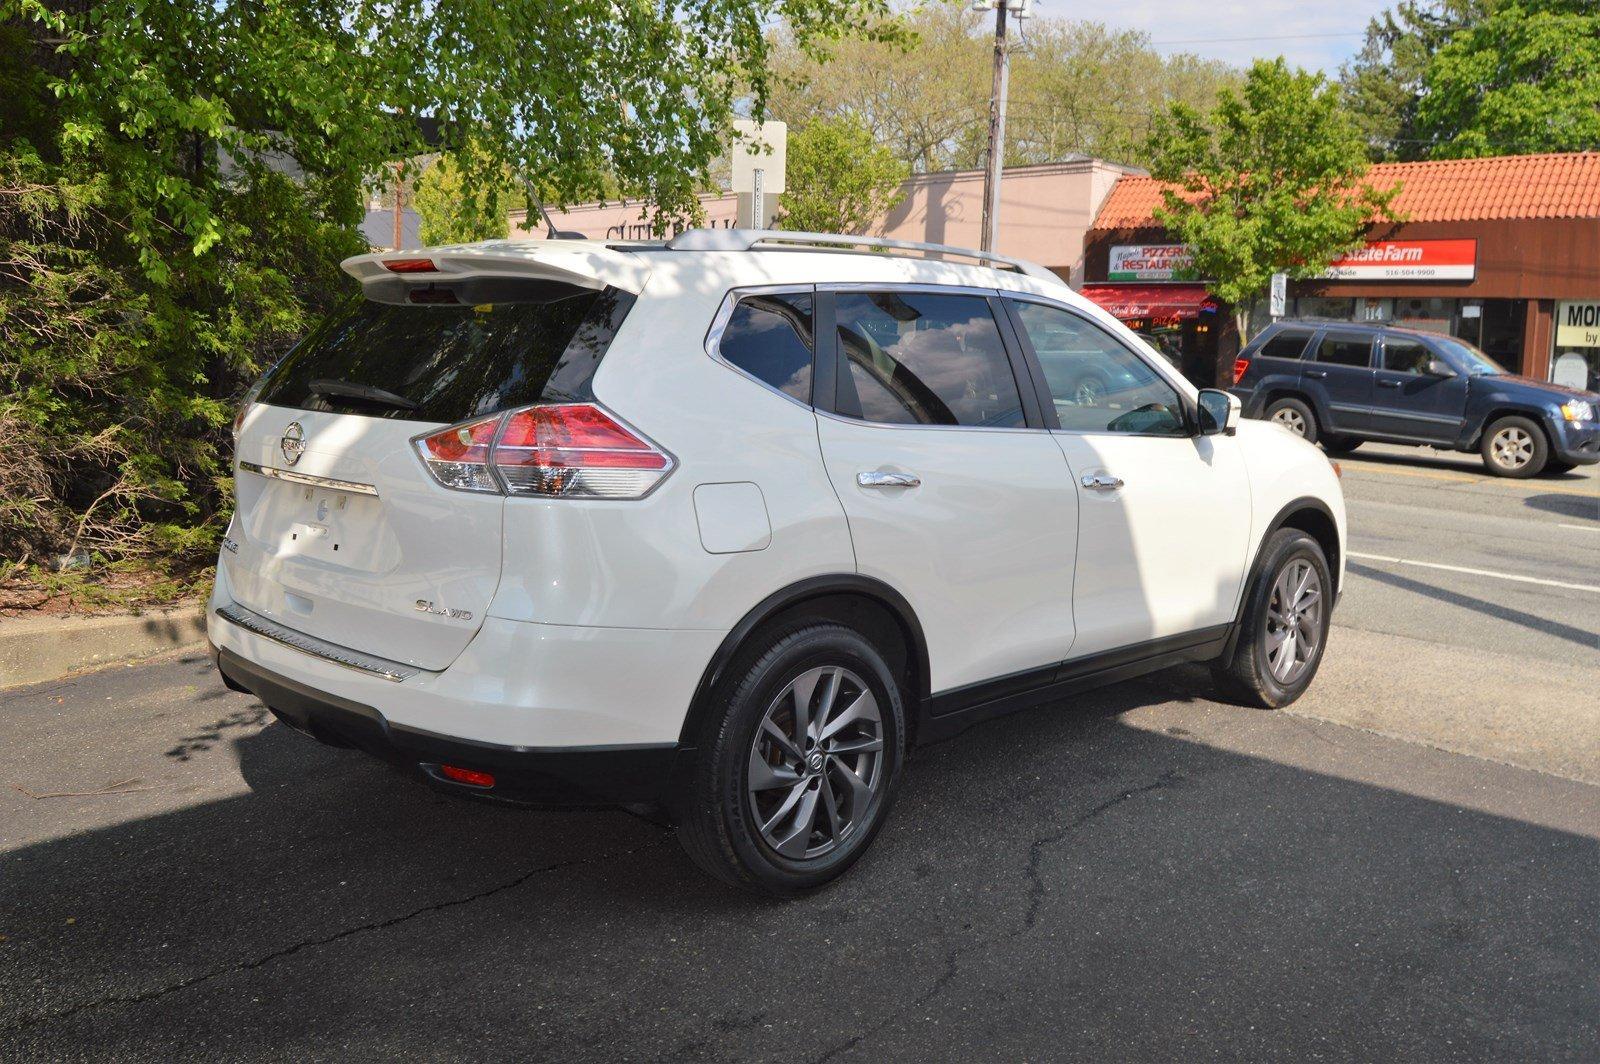 Used-2016-Nissan-Rogue-SL